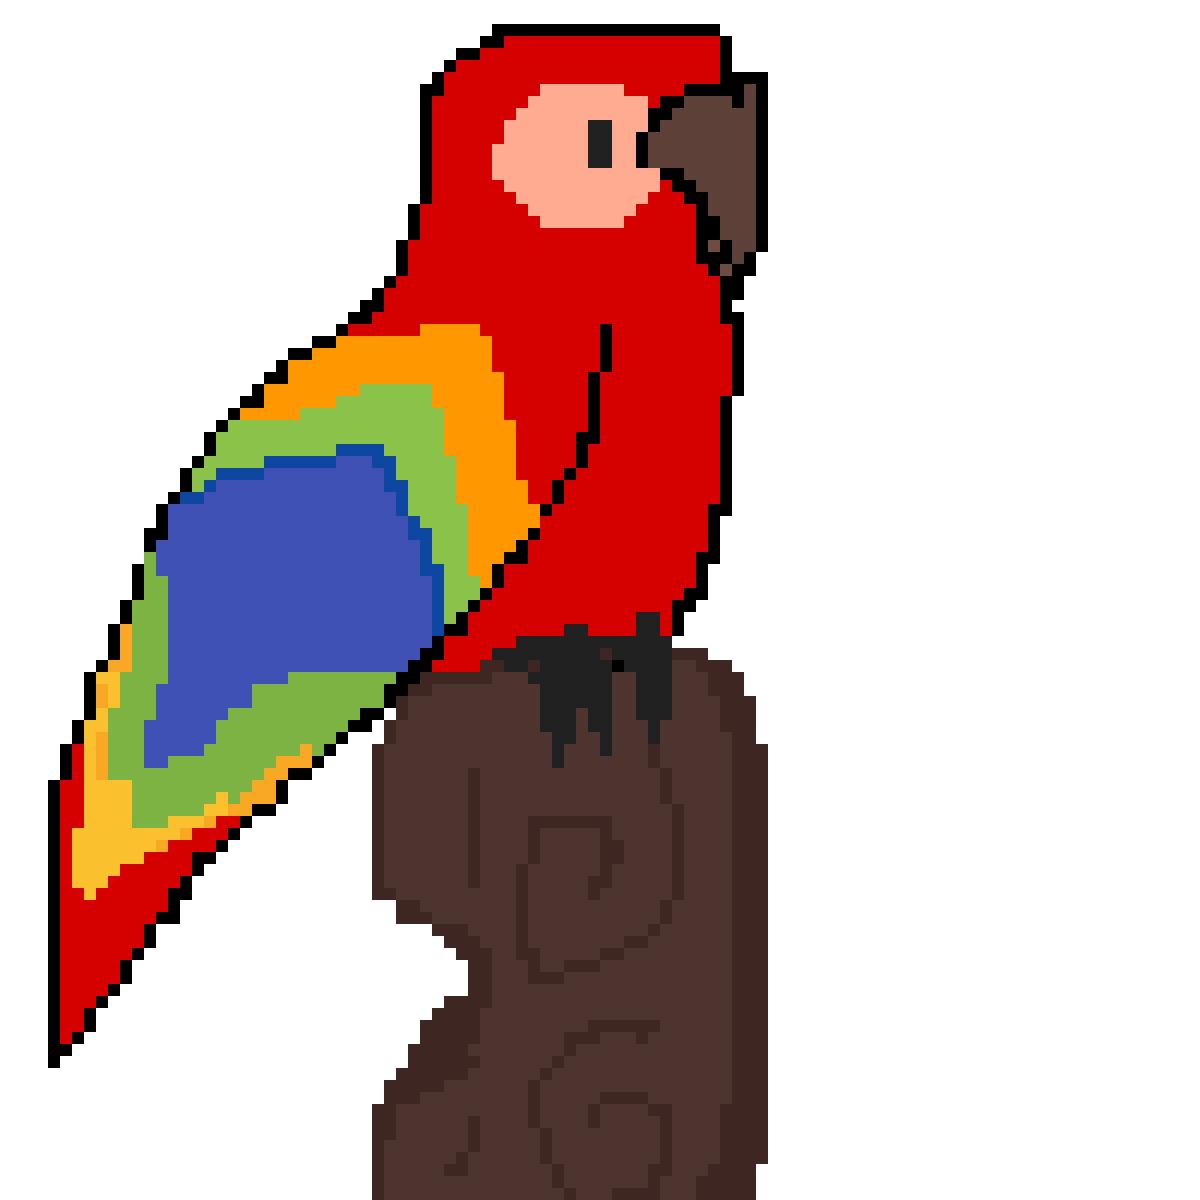 Parrot by rarapiopio